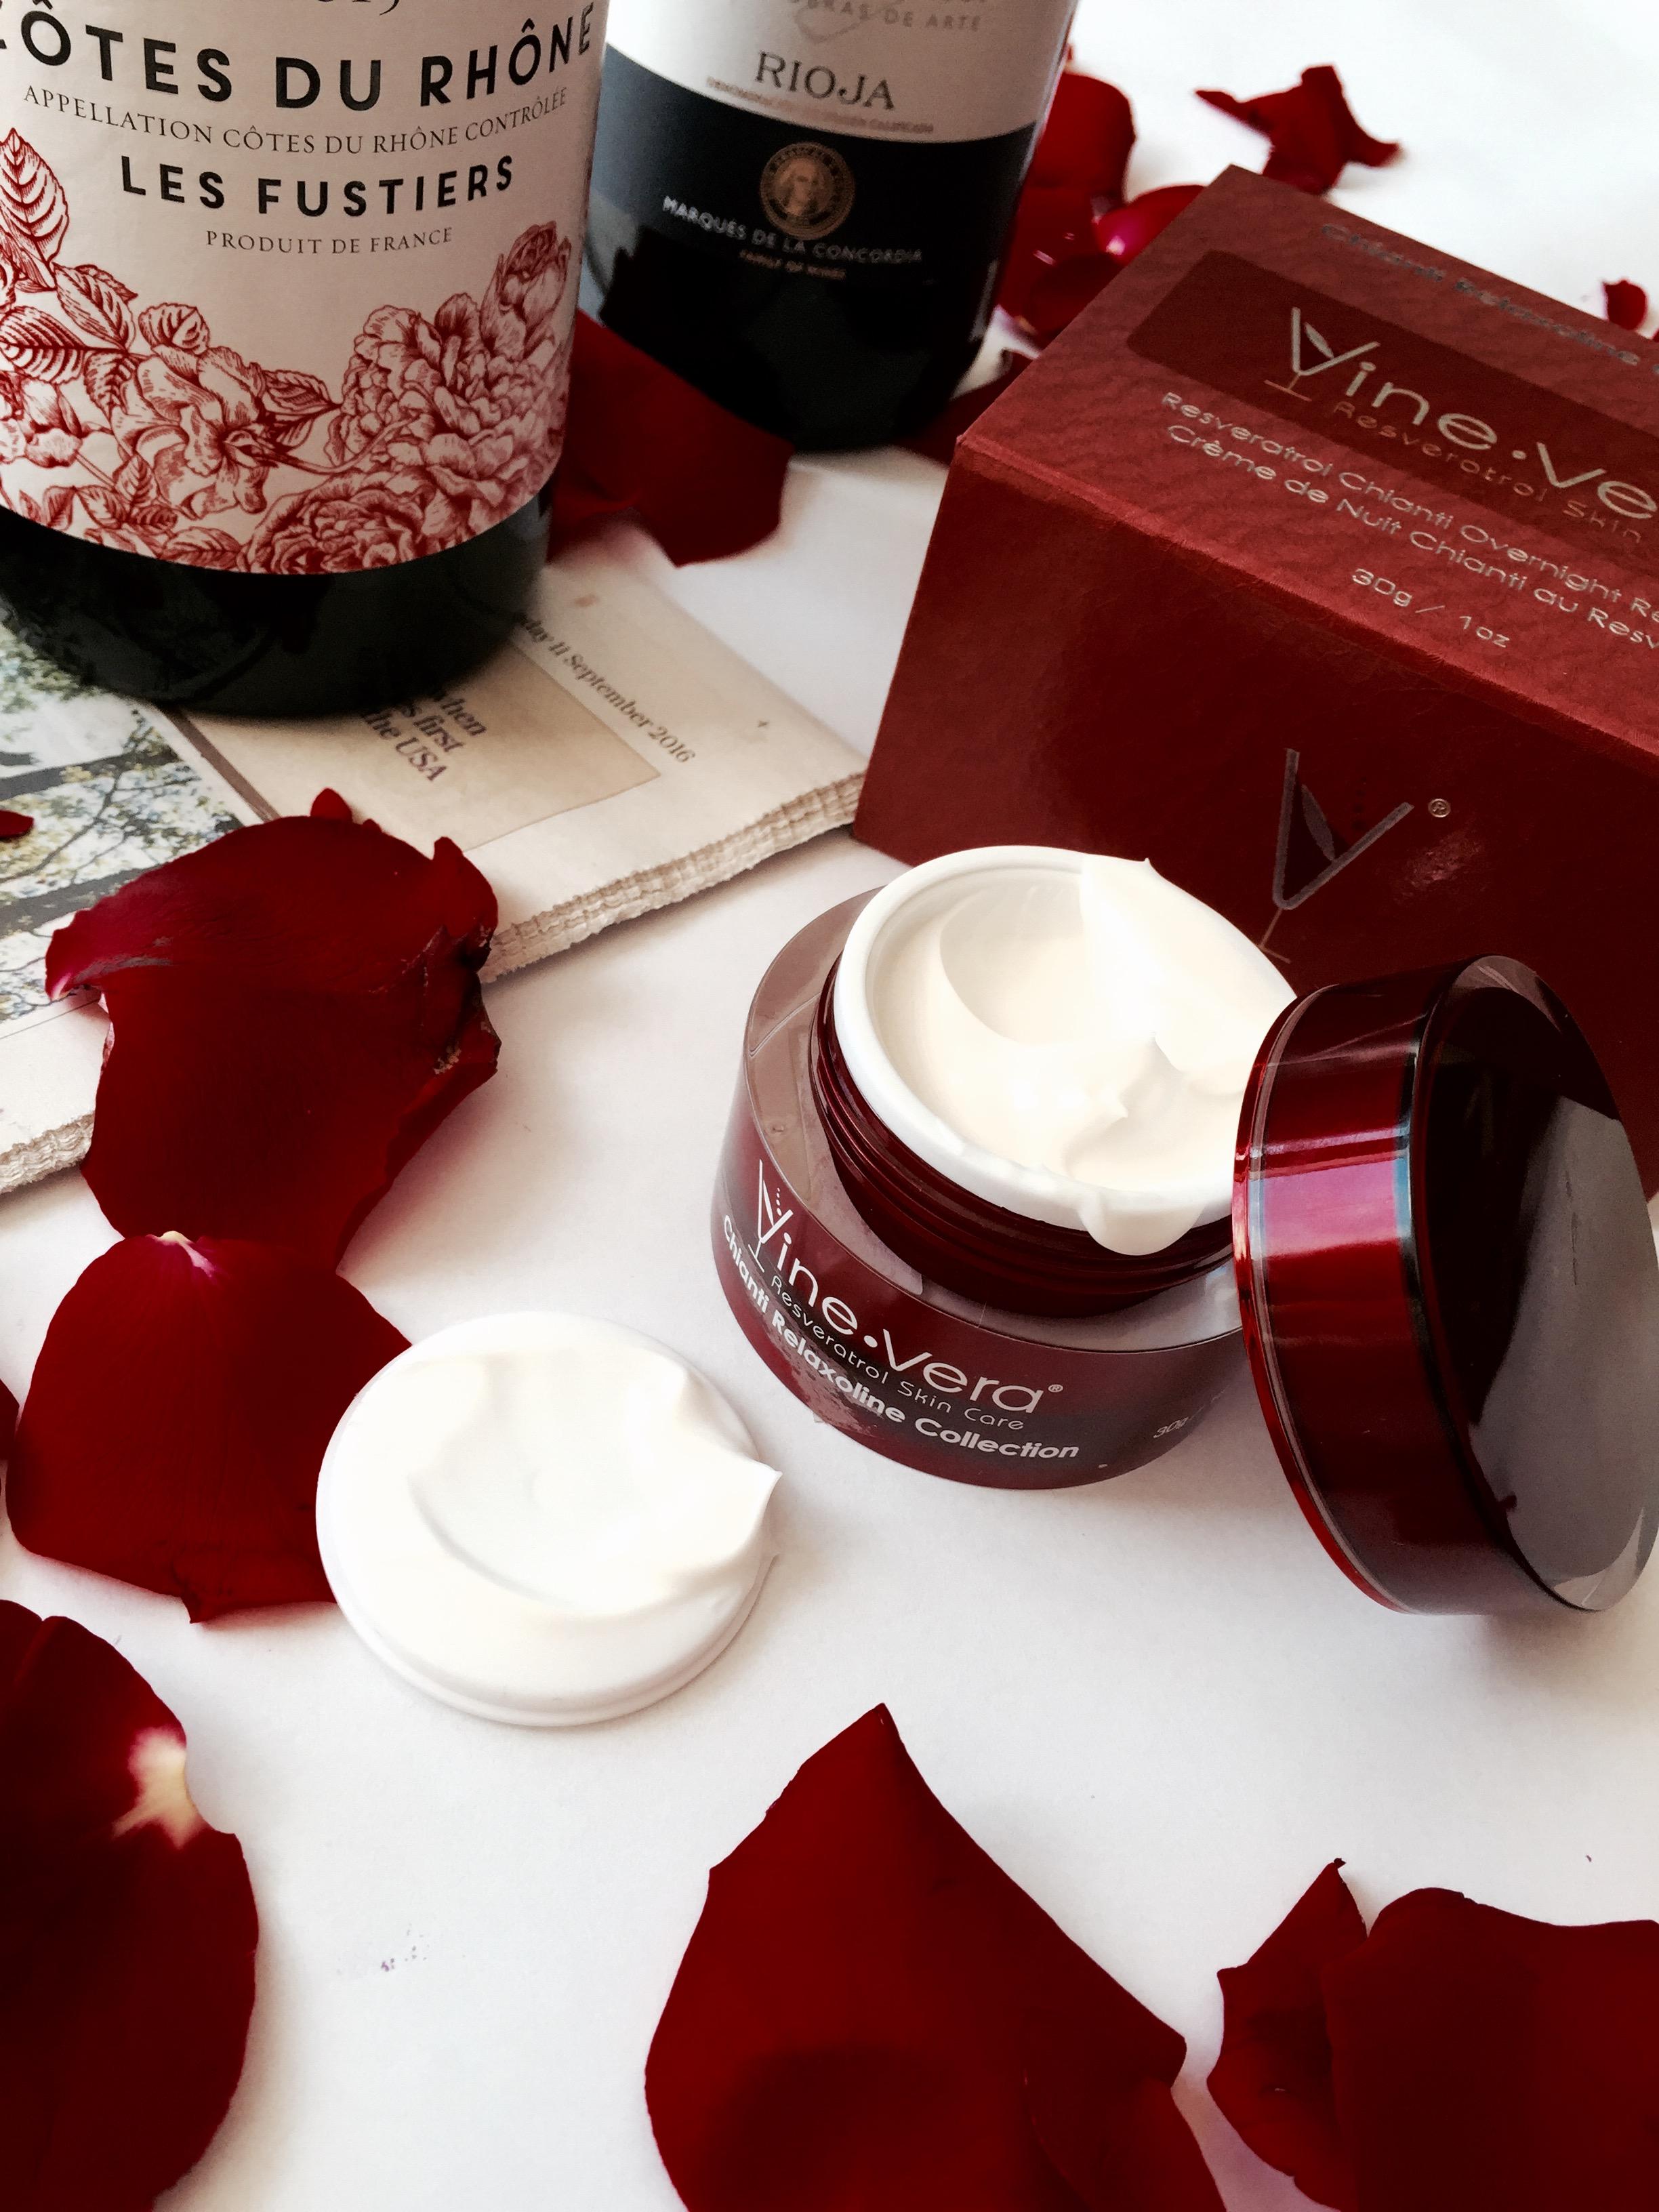 Vine Vera Resveratrol Chianti Overnight Recovery - £300